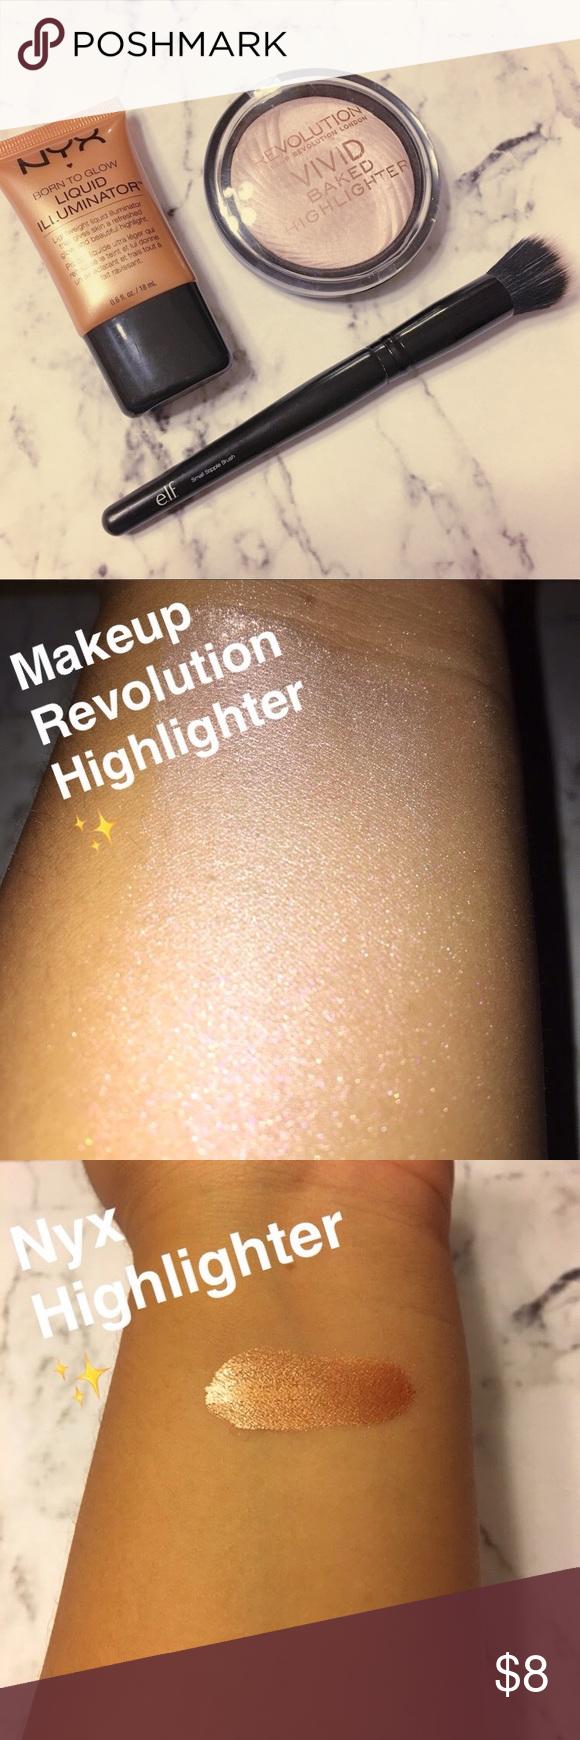 HIGHLIGHTER SET Pretty glowy highlighters Makeup Luminizer